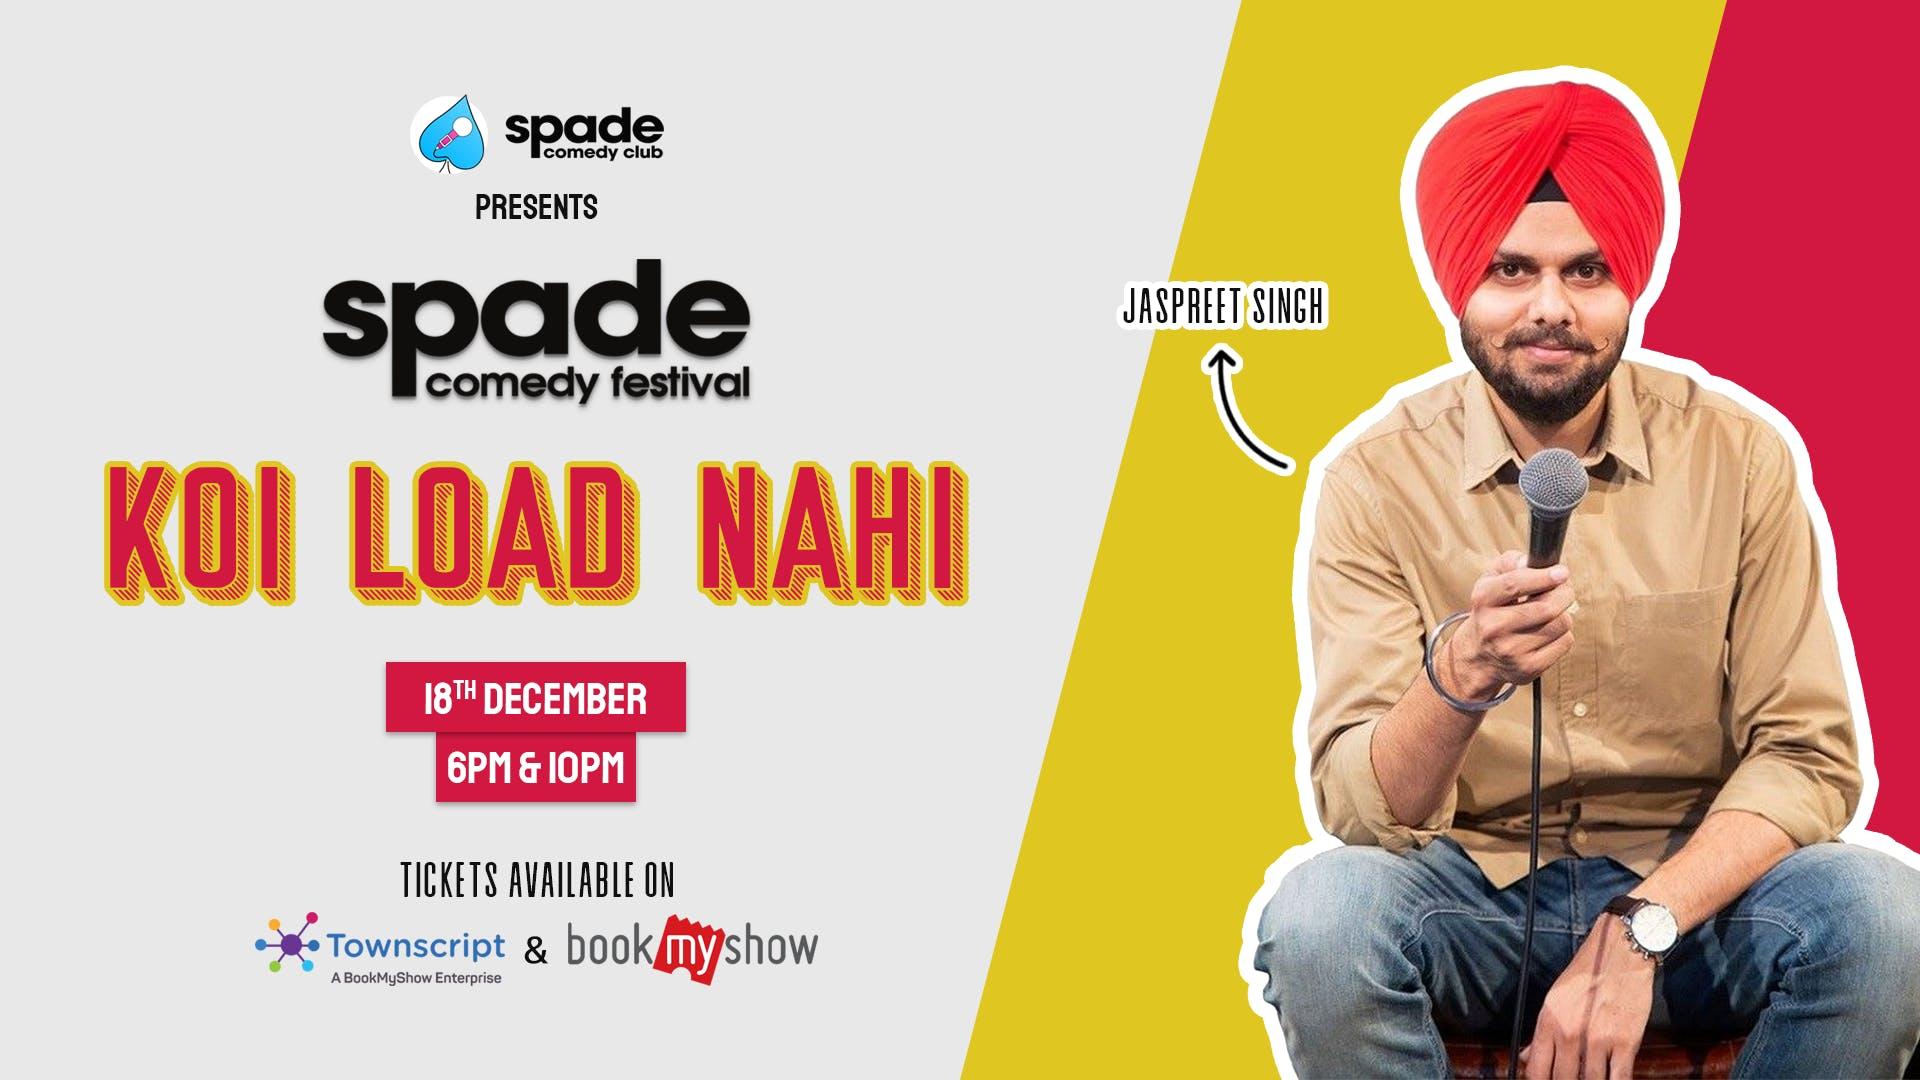 Koi Load Nahi by Jaspreet Singh at Spade Comedy Festival